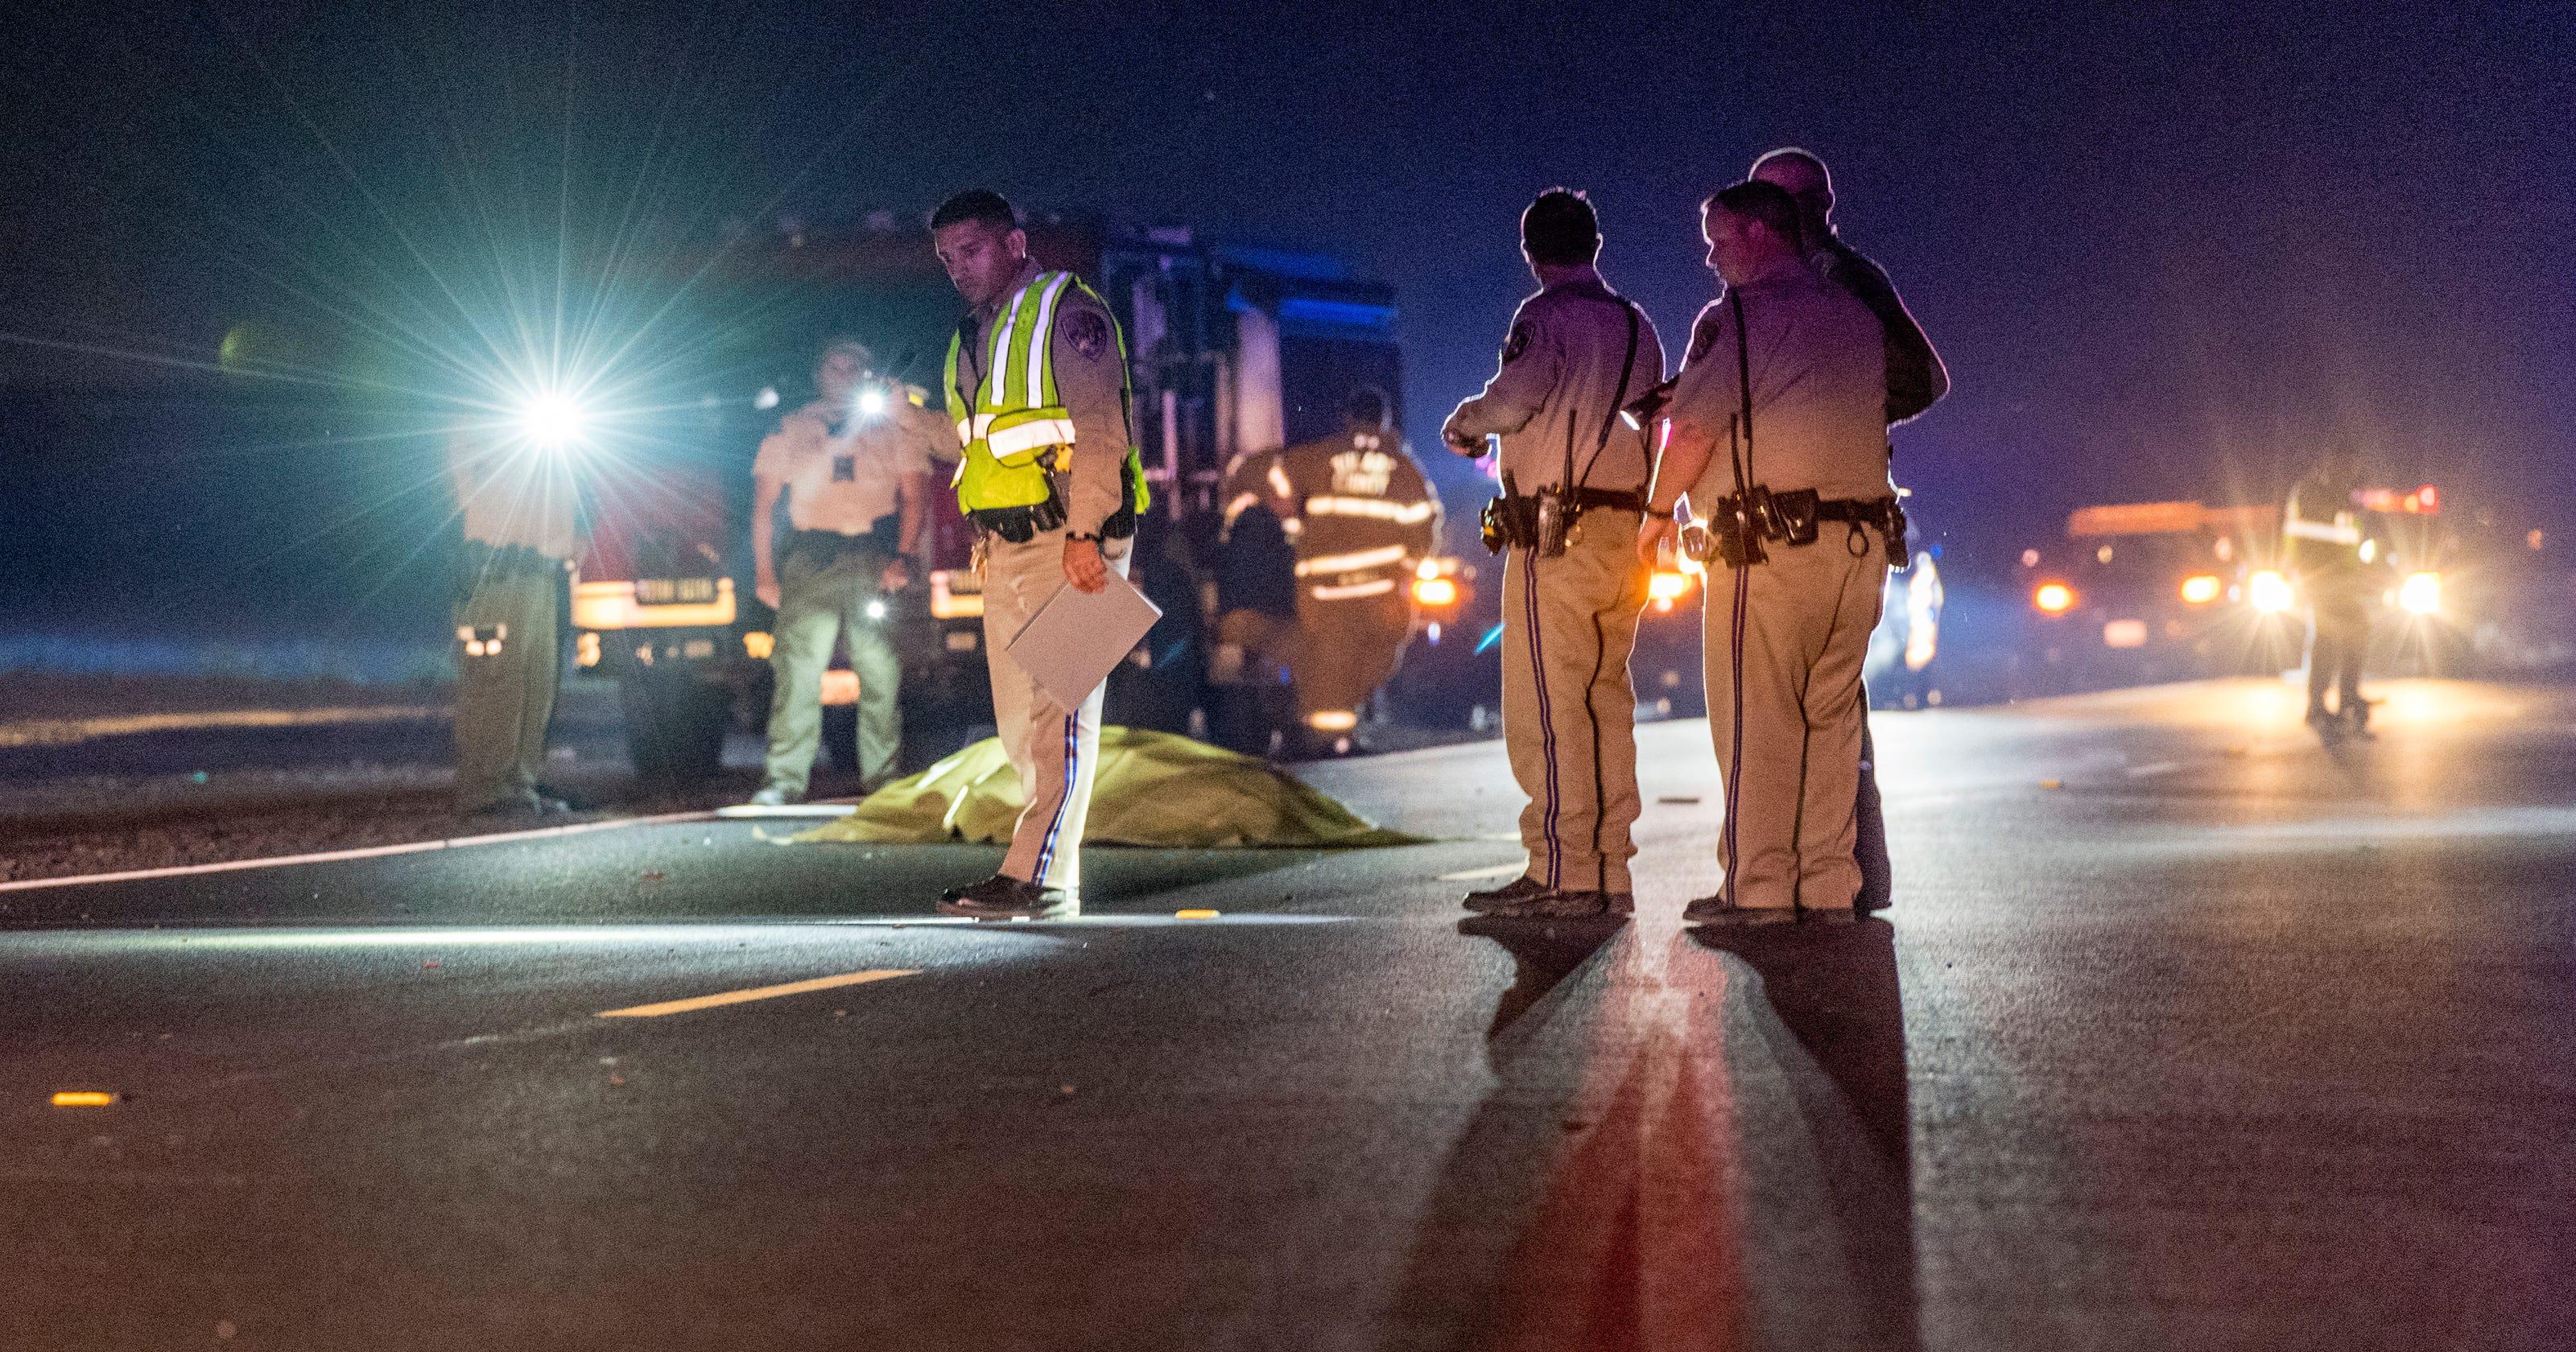 CHP investigates fatal Tulare hit-and-run